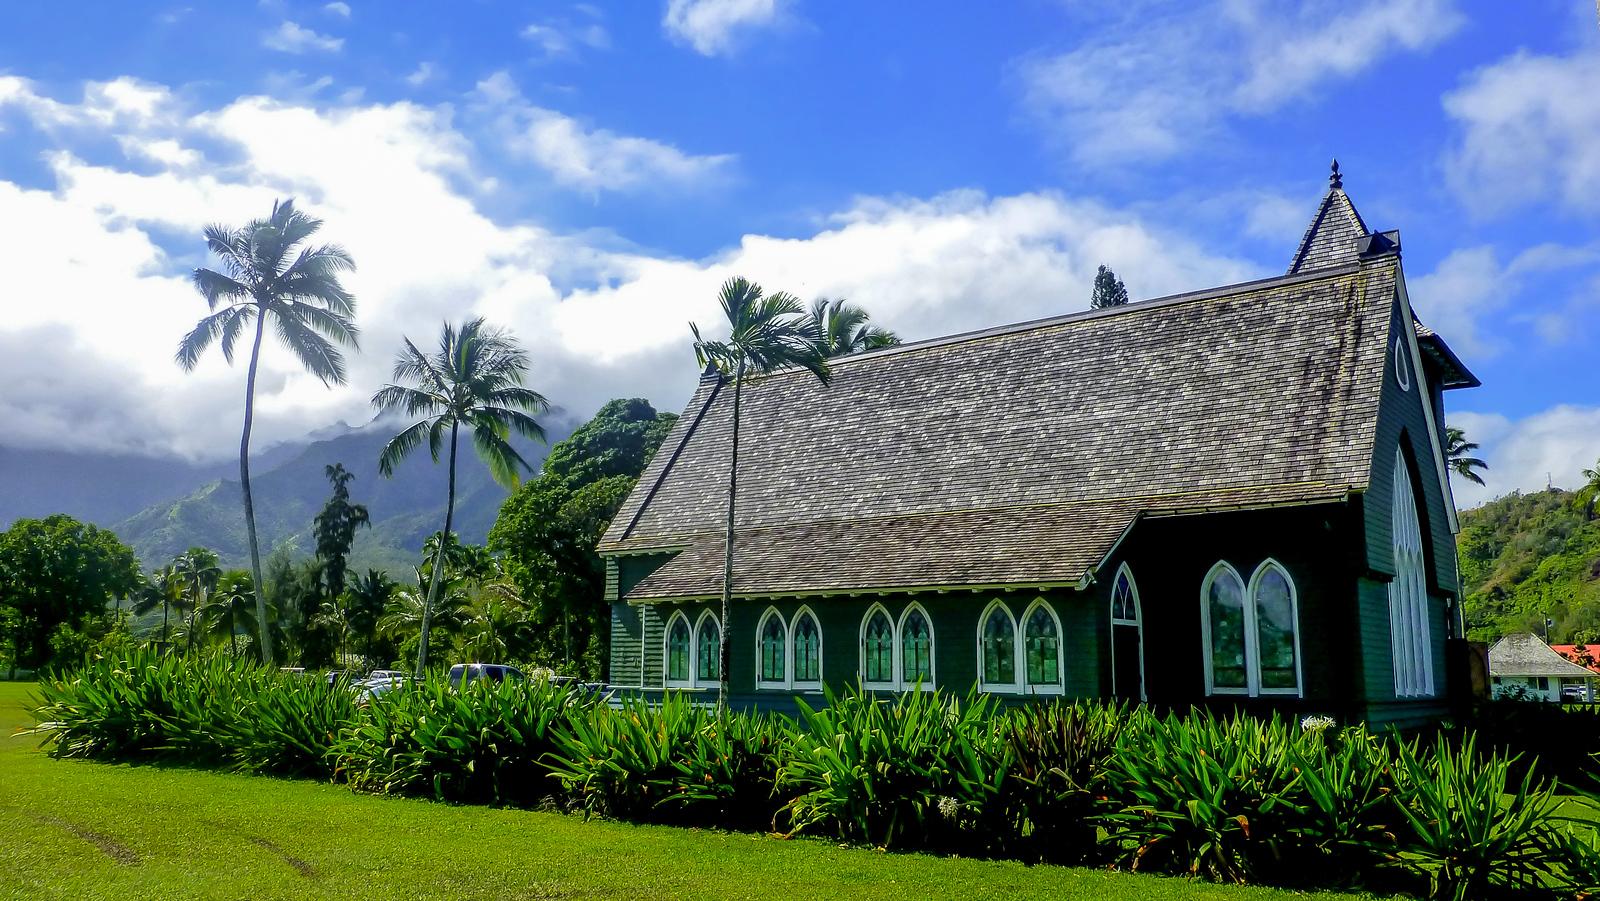 3 Week Hawaii Itinerary. Hanalei Town, Kauai